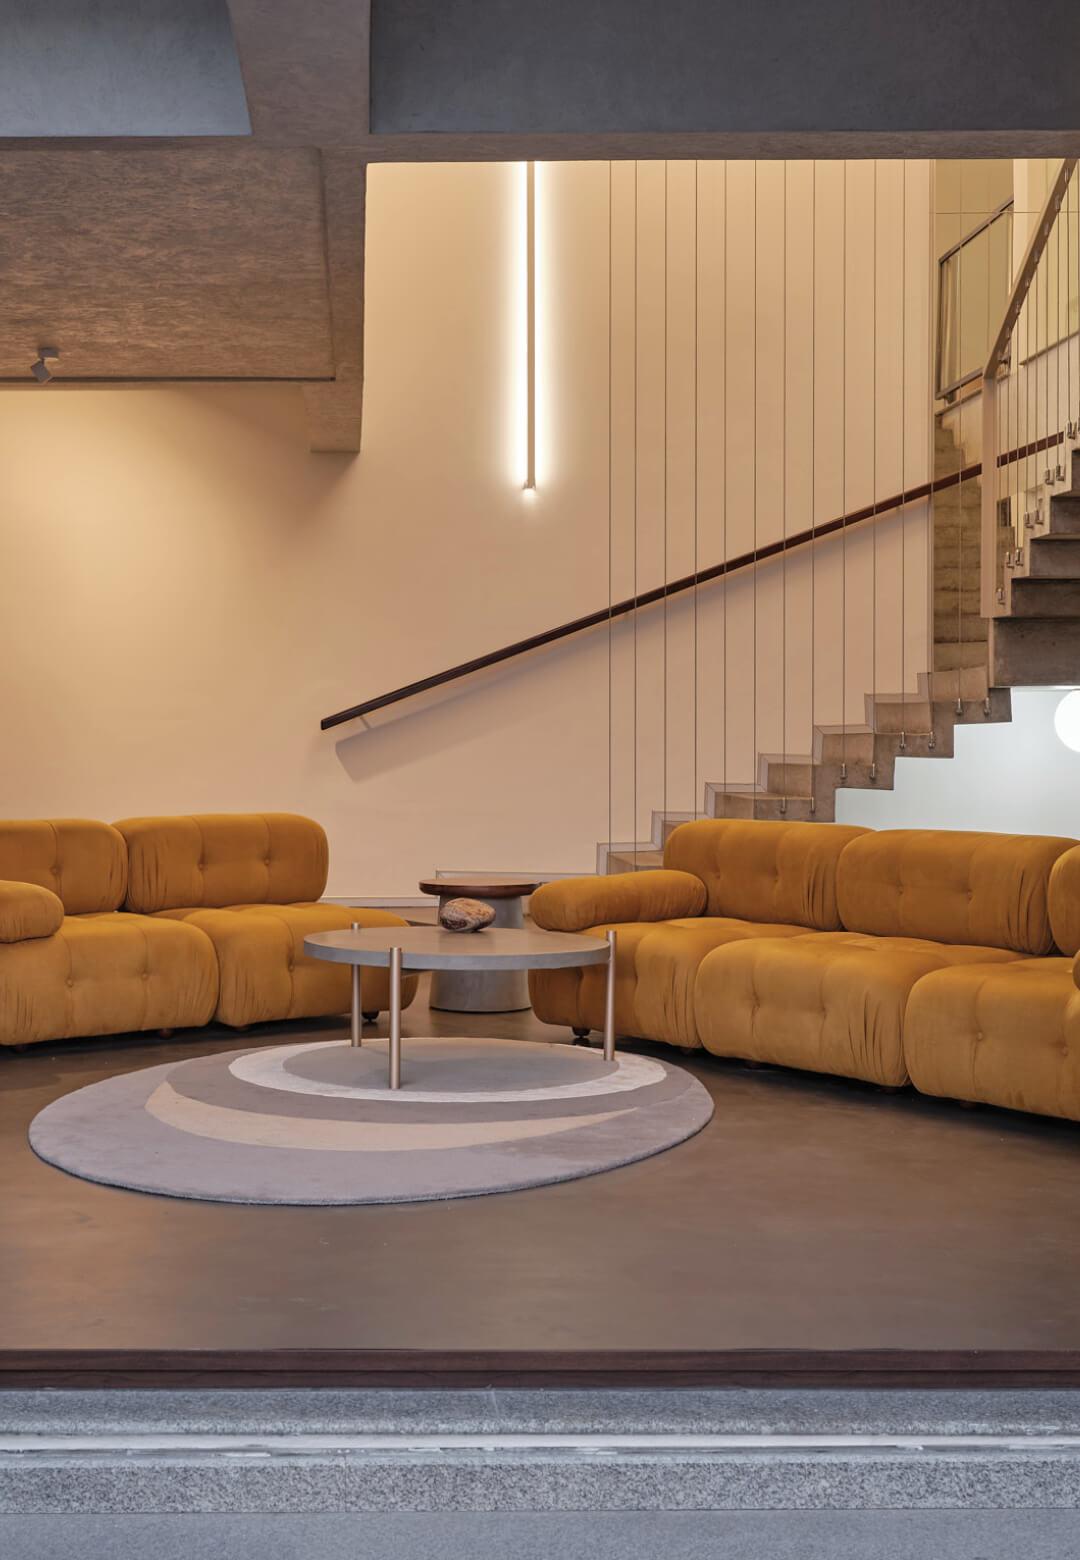 Inside Living Walls penthouse in Bengaluru, India designed by Treelight Design | Living Walls by Treelight Design | STIRworld